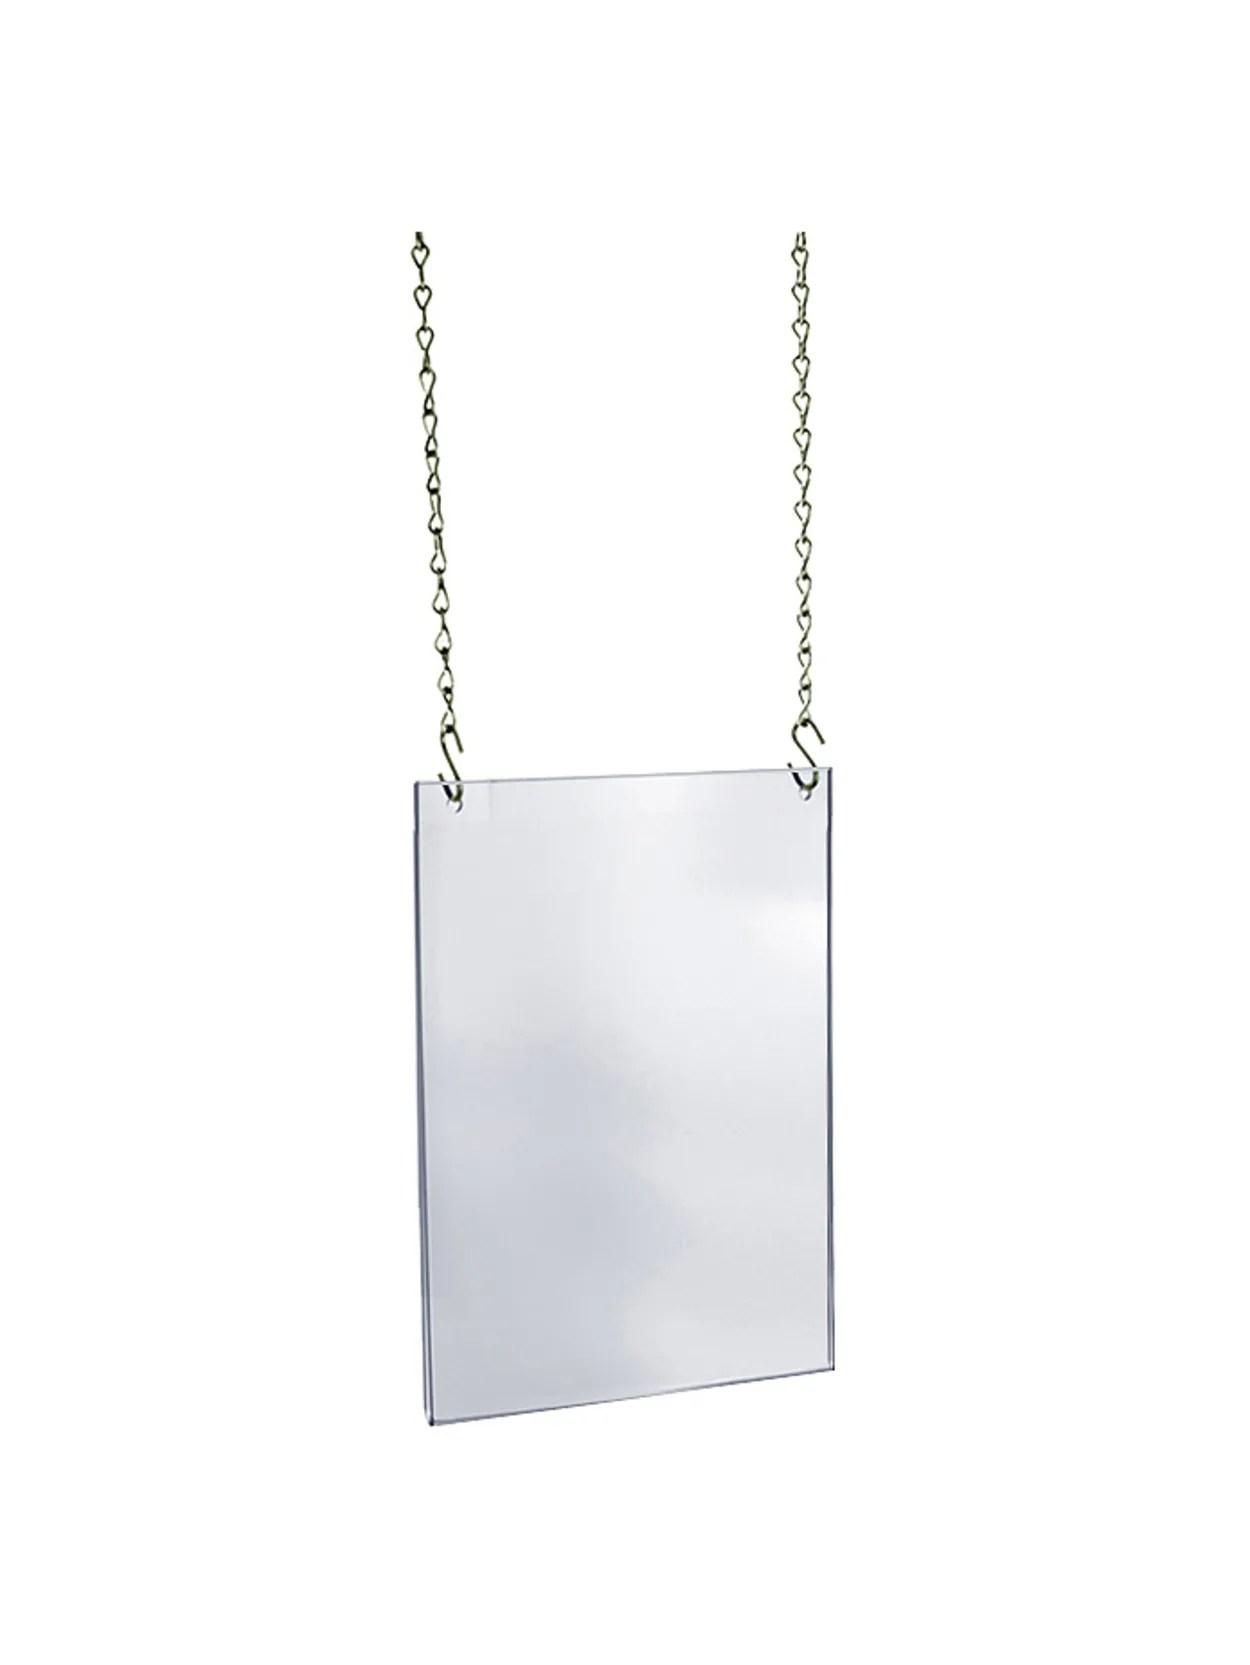 azar displays hanging poster frame ledger tabloid 11 x 17 clear item 7679119